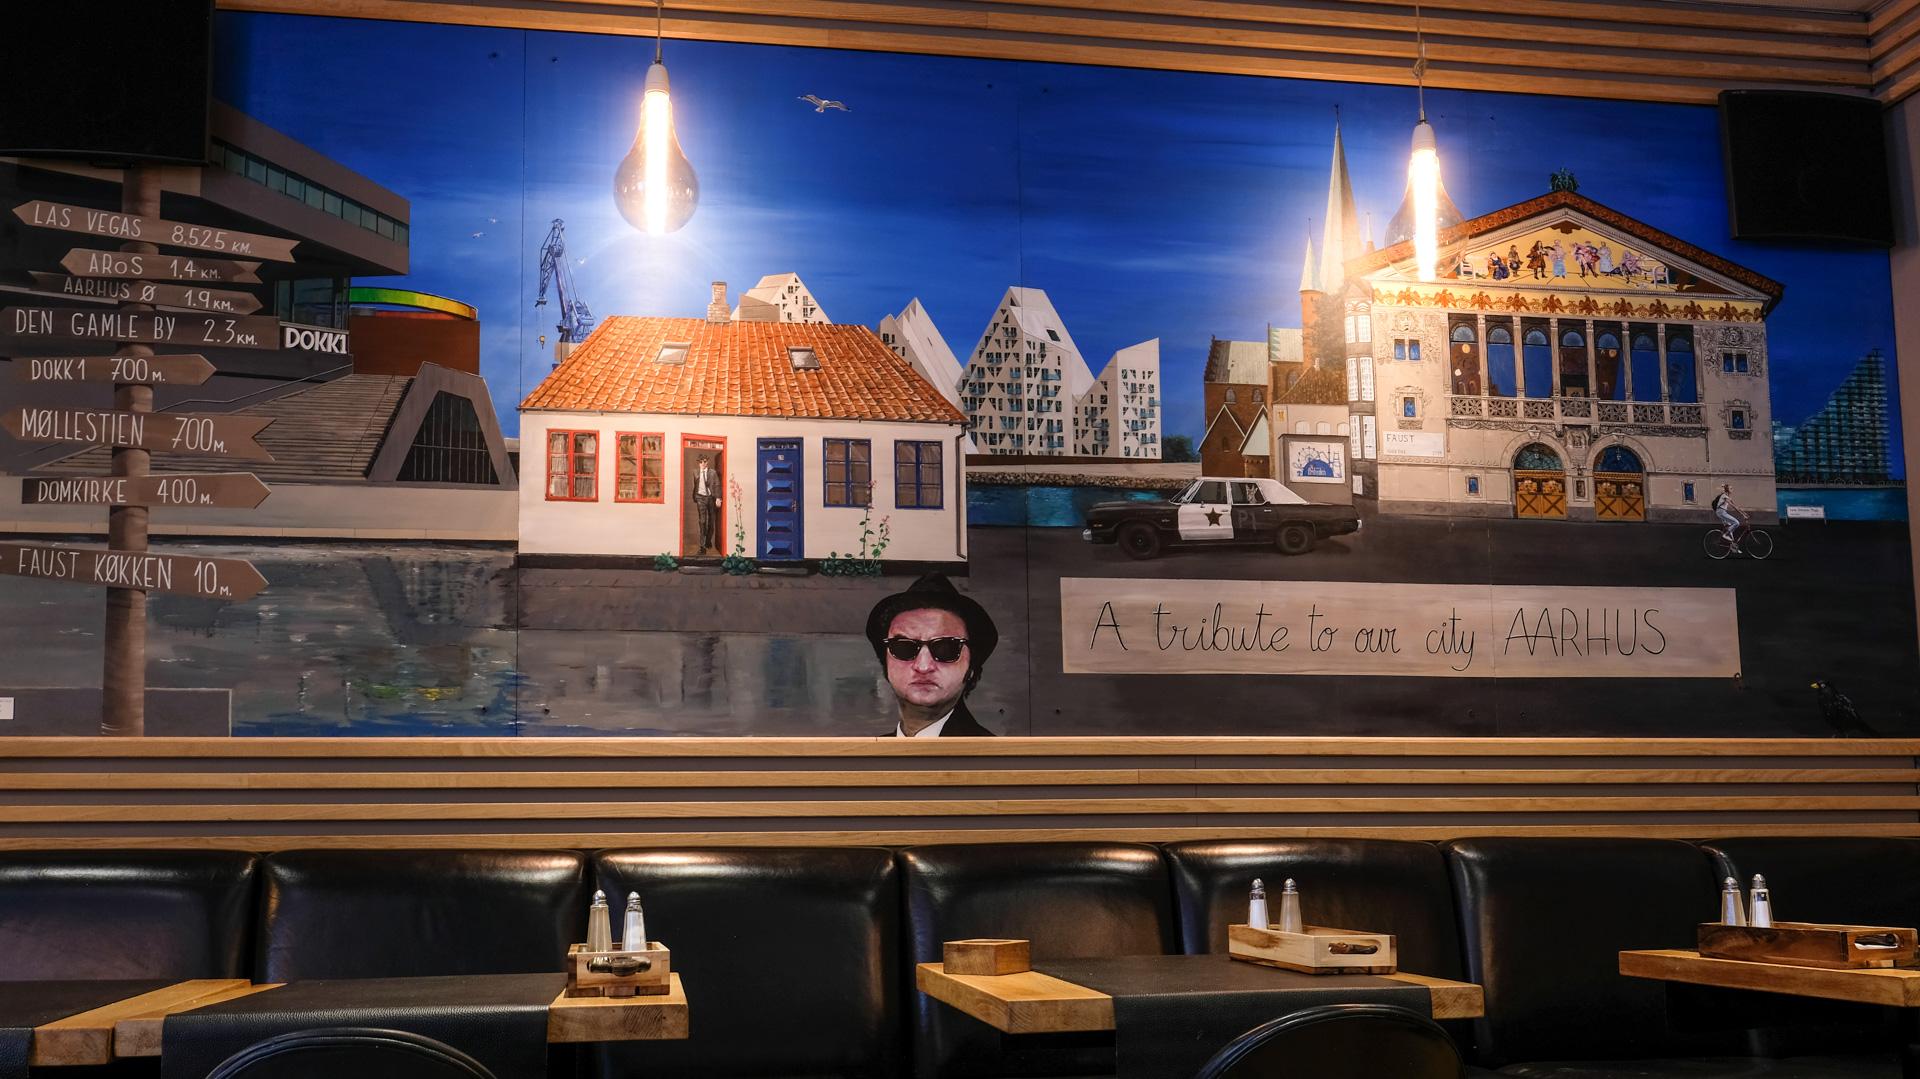 Café Faust har fået en vild idé: Maler Aarhus' historie på væggene